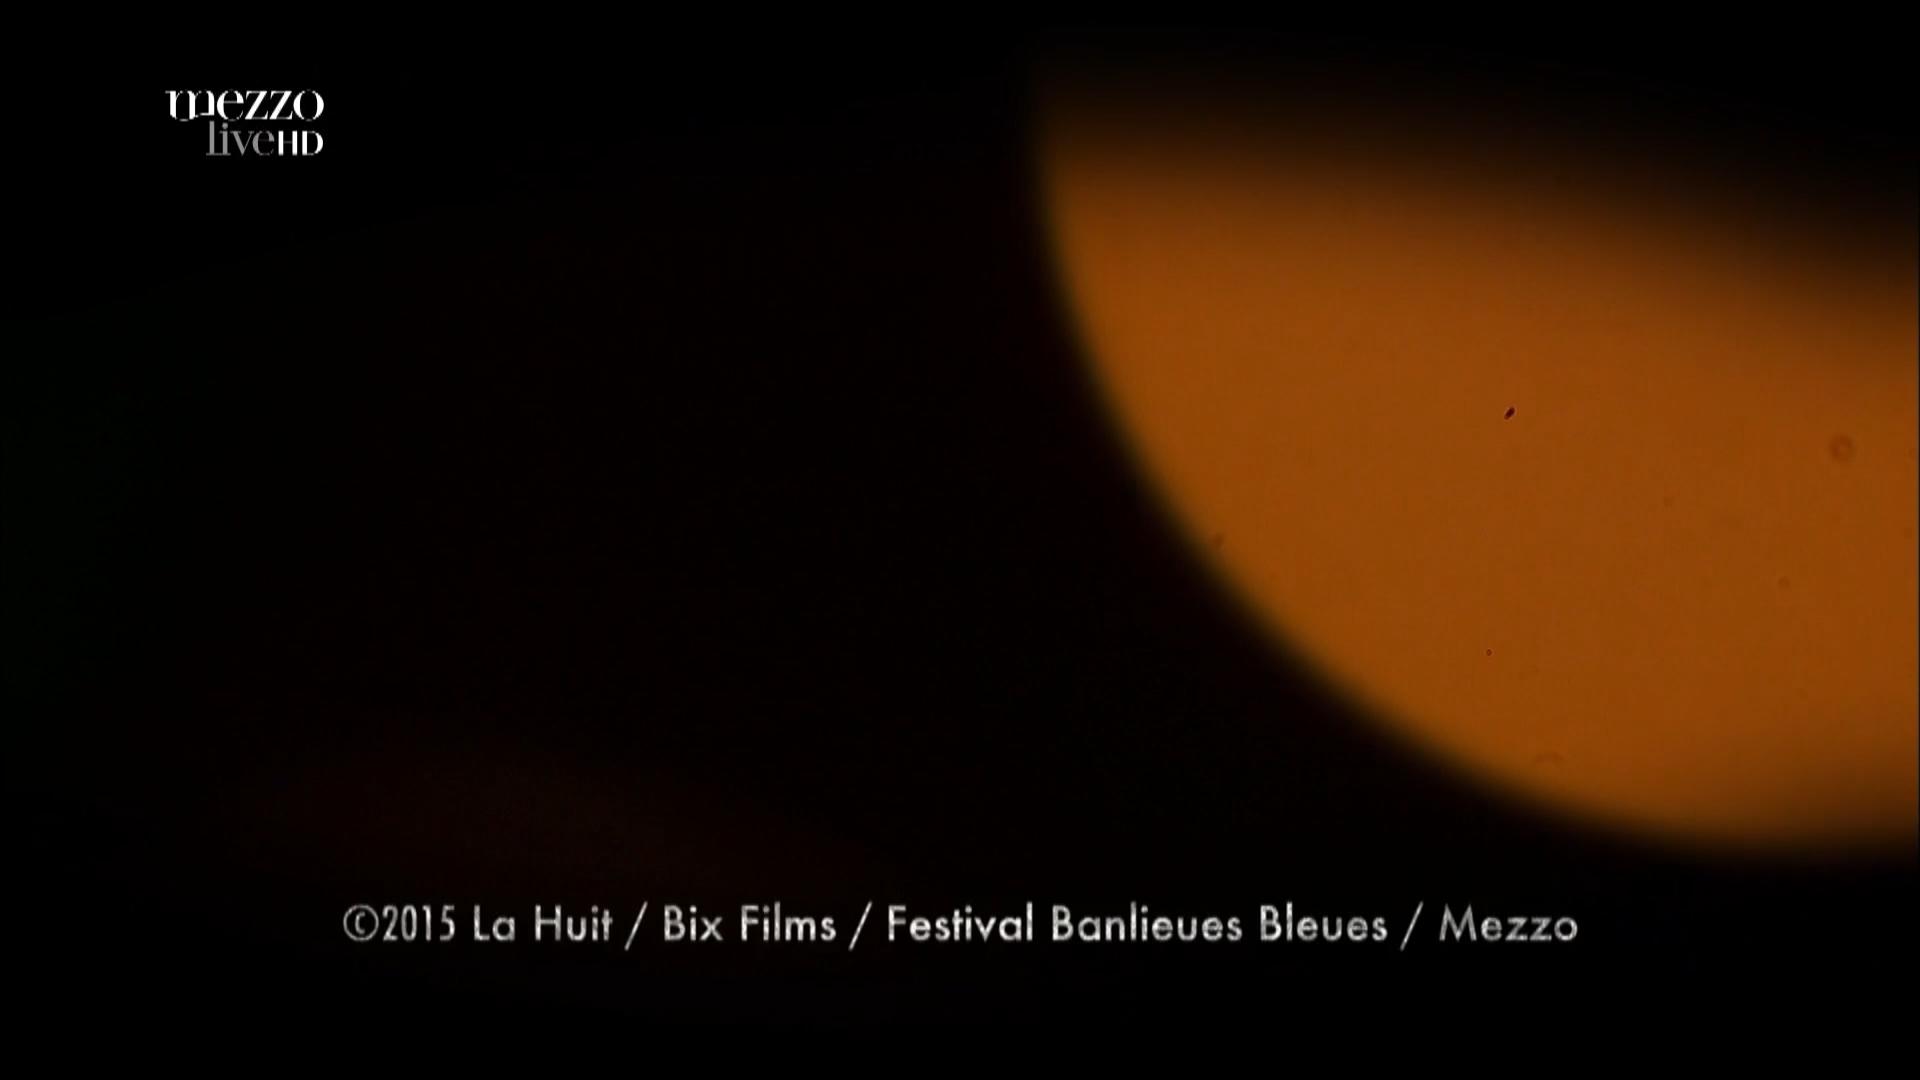 2015 David Murray Infinity Quartet feat. Saul Williams - Disruption at Banlieues Bleues Jazz Fest [HDTV 1080i] 20